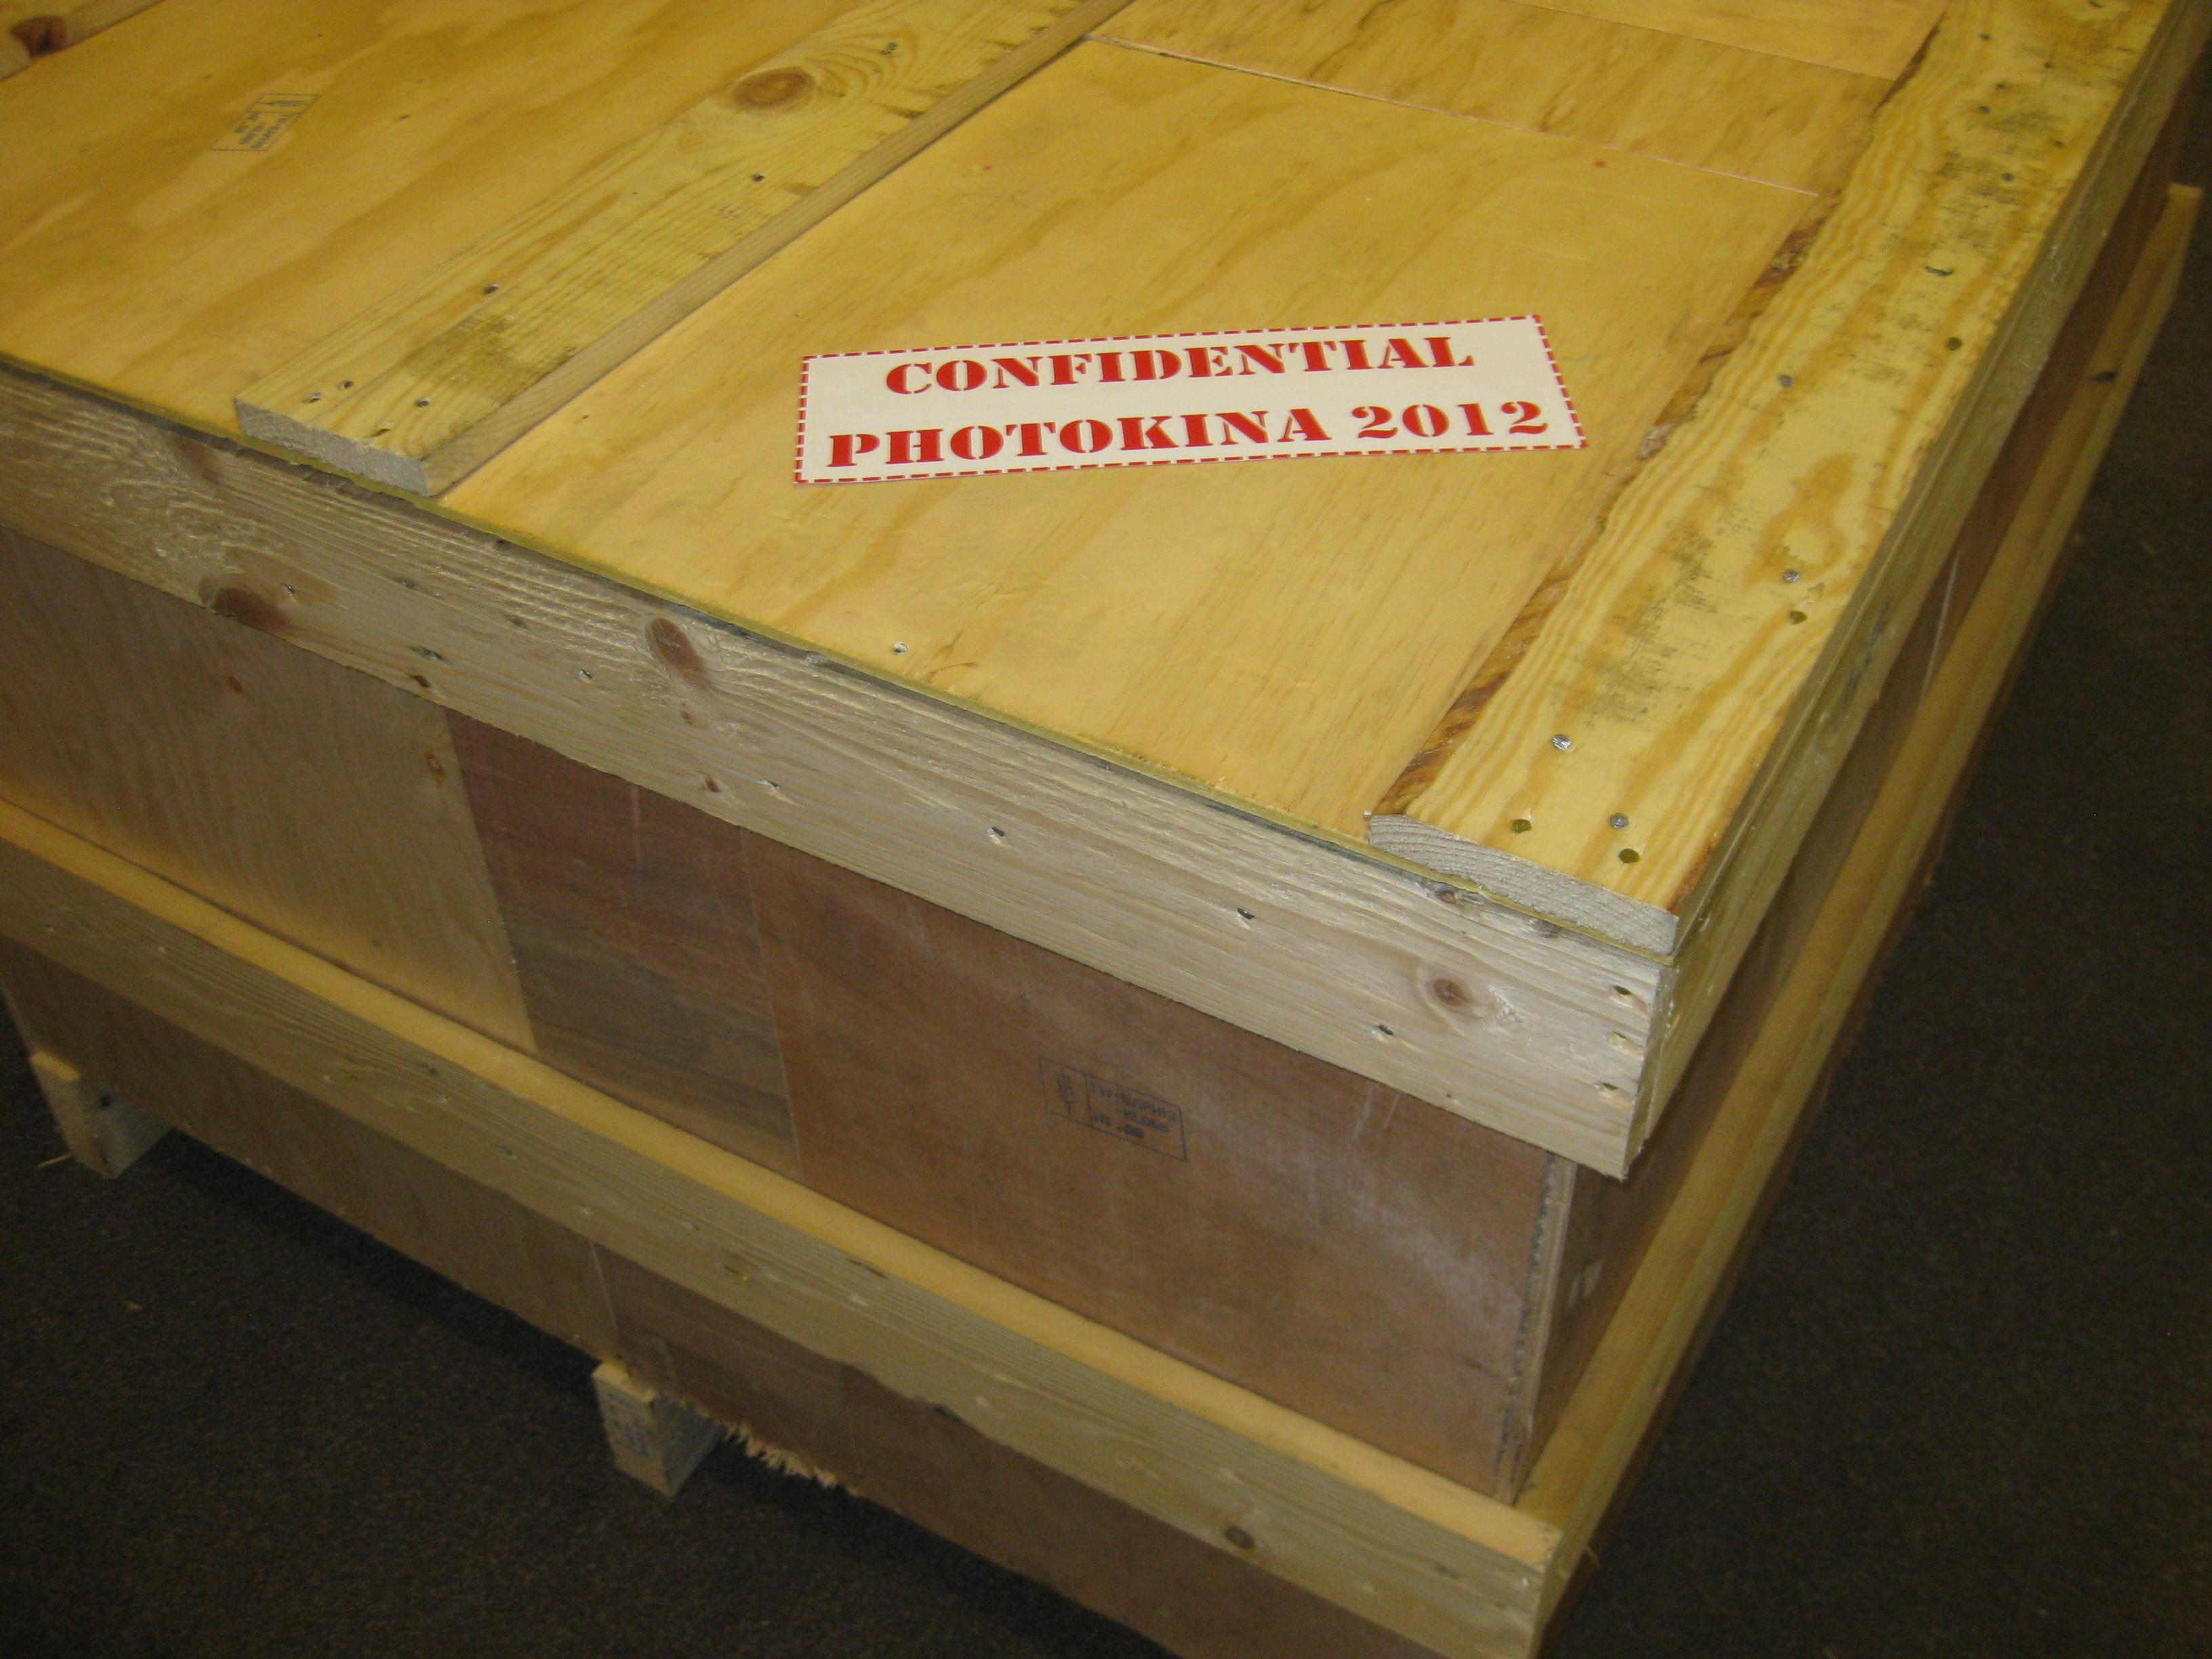 shipping box of an photo machine